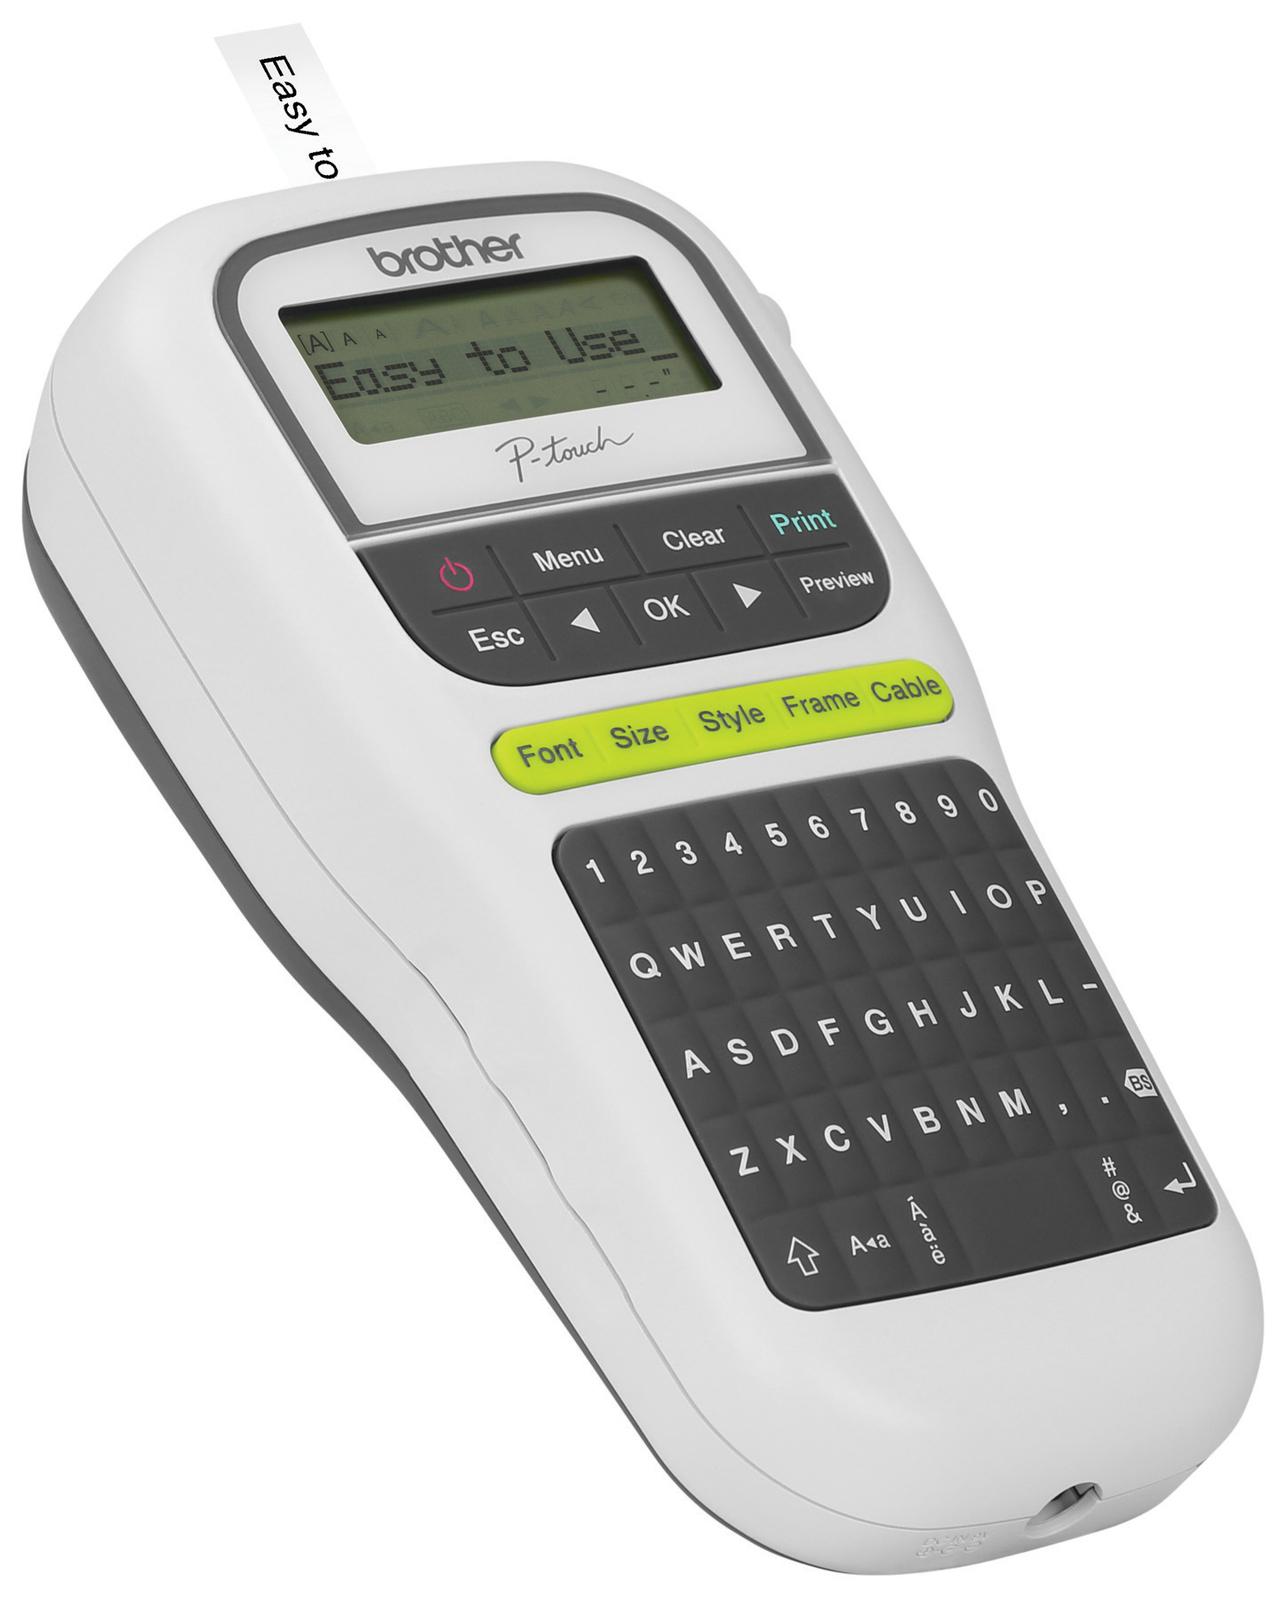 Brother PT-H110 Portable Label Maker (White) image